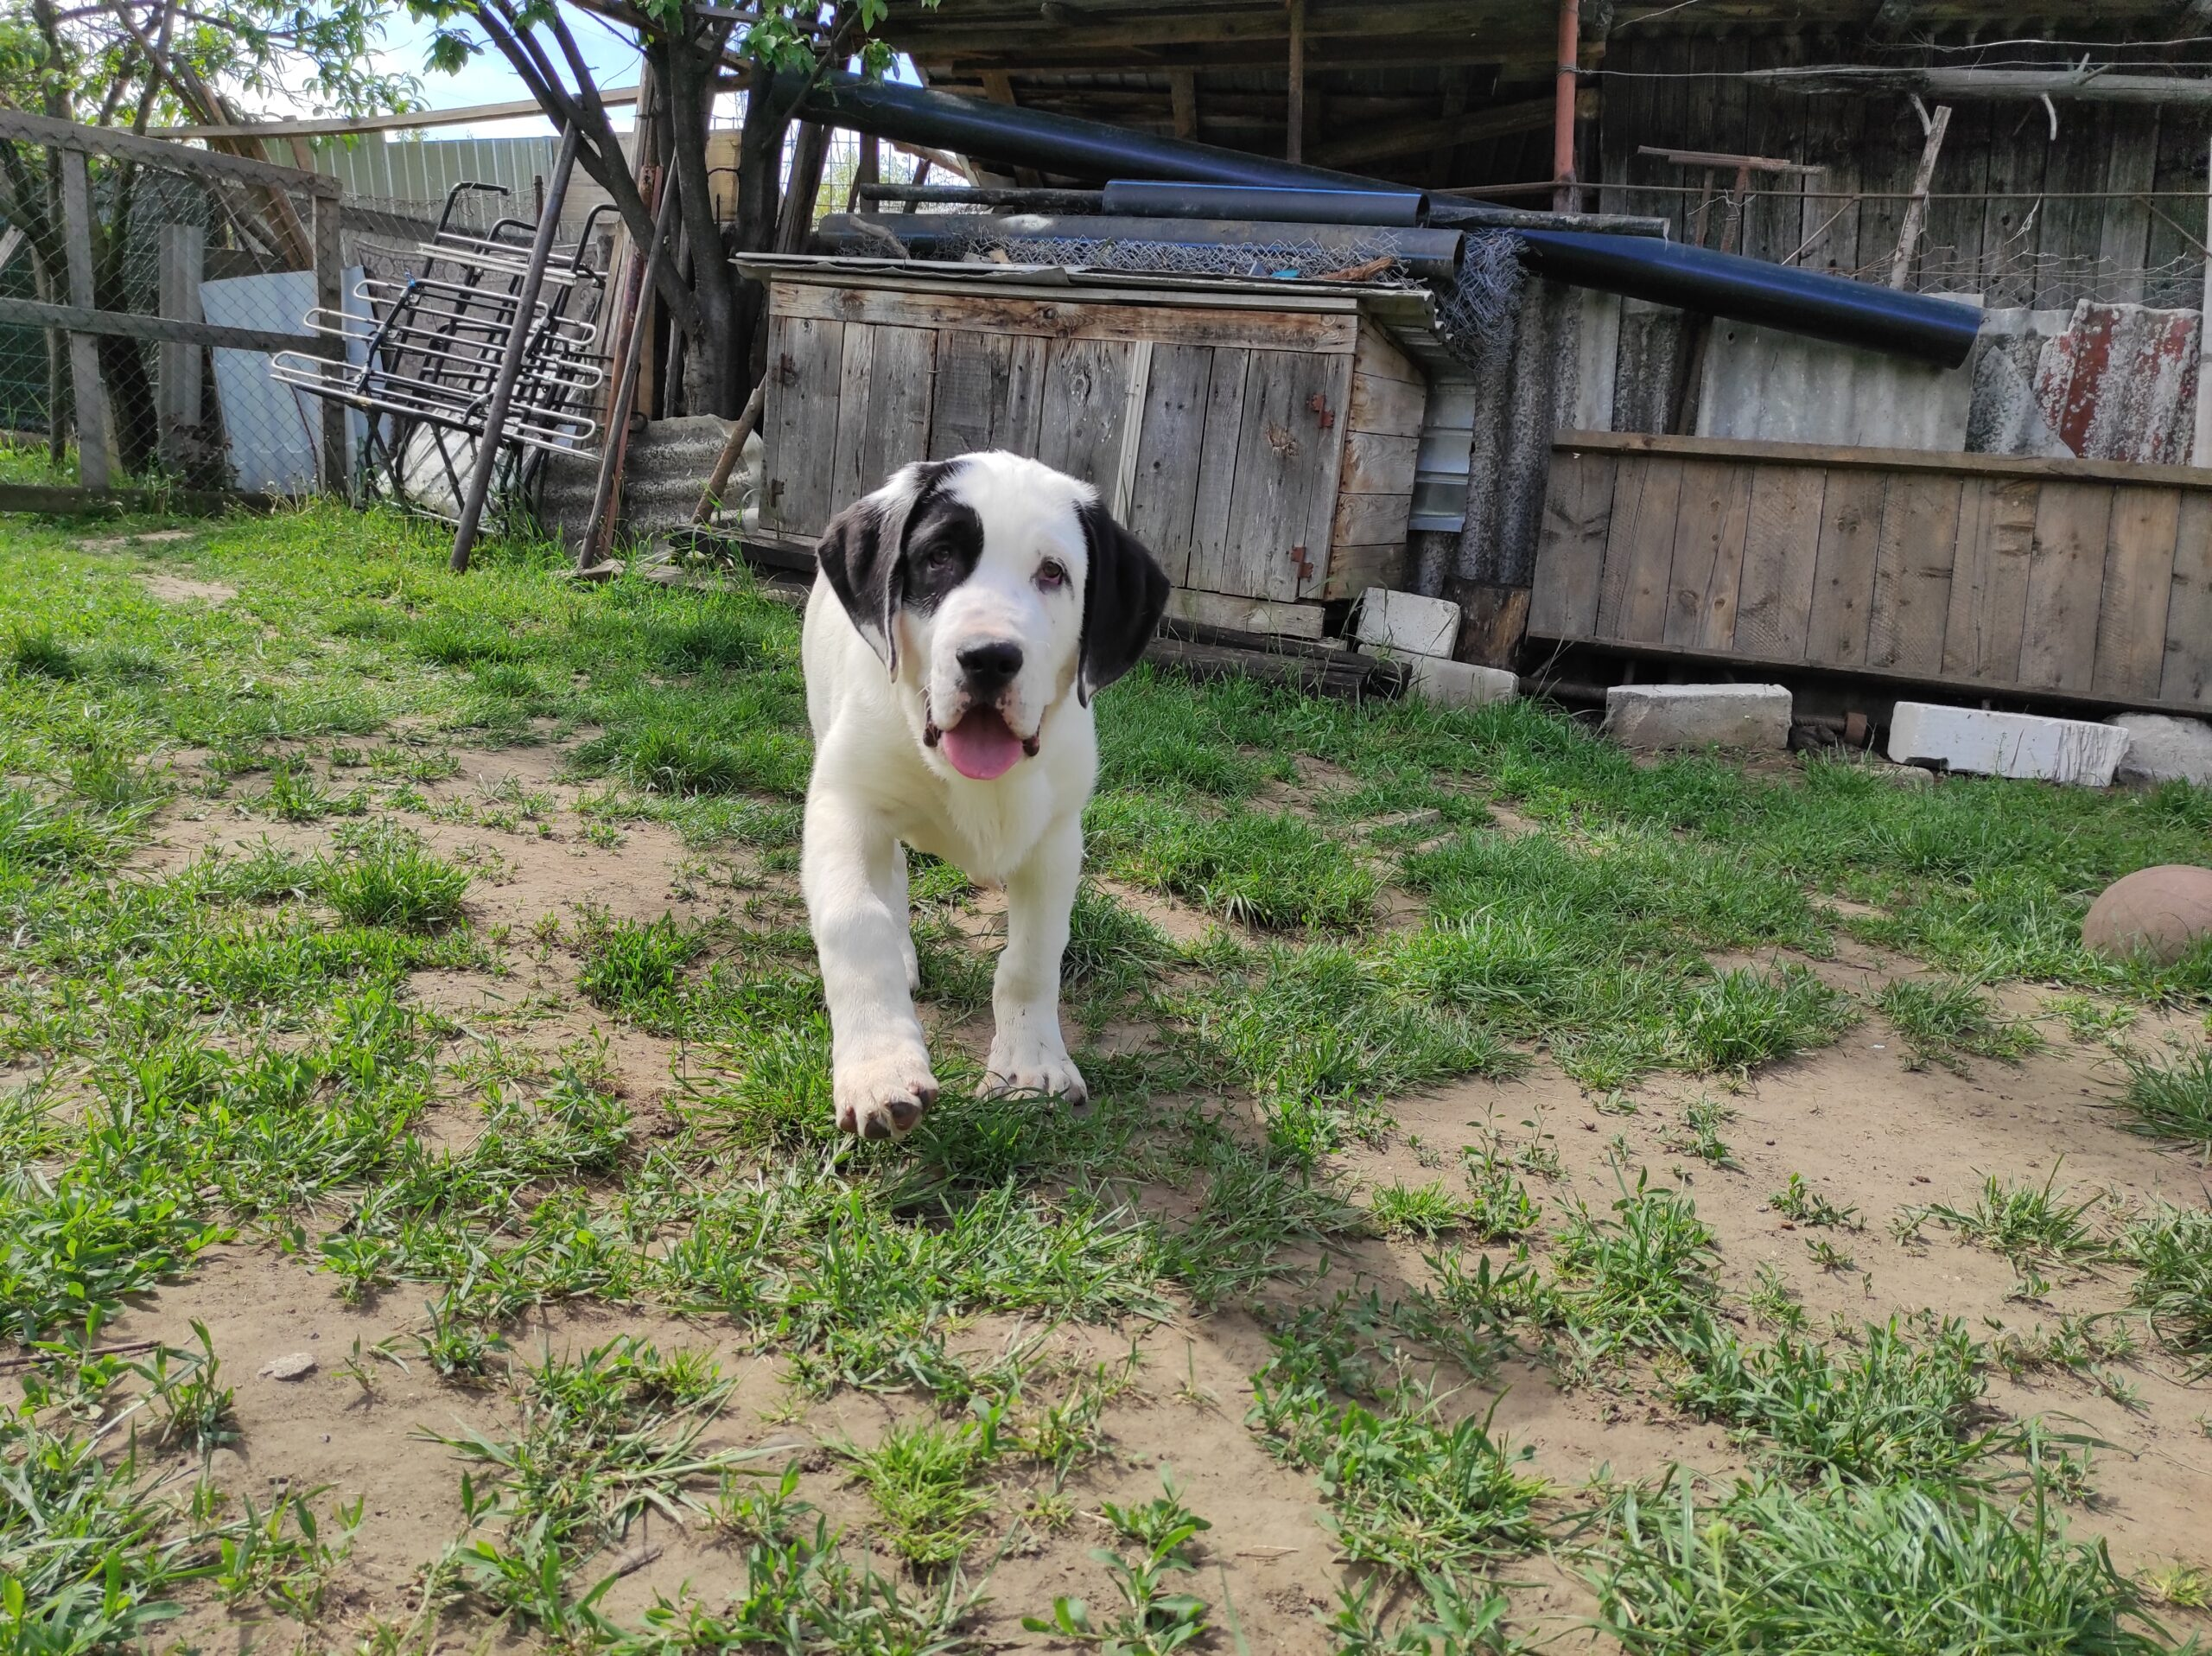 Central Asian Ovtcharka / Central Asian Shepherd Dog - Alabai puppies